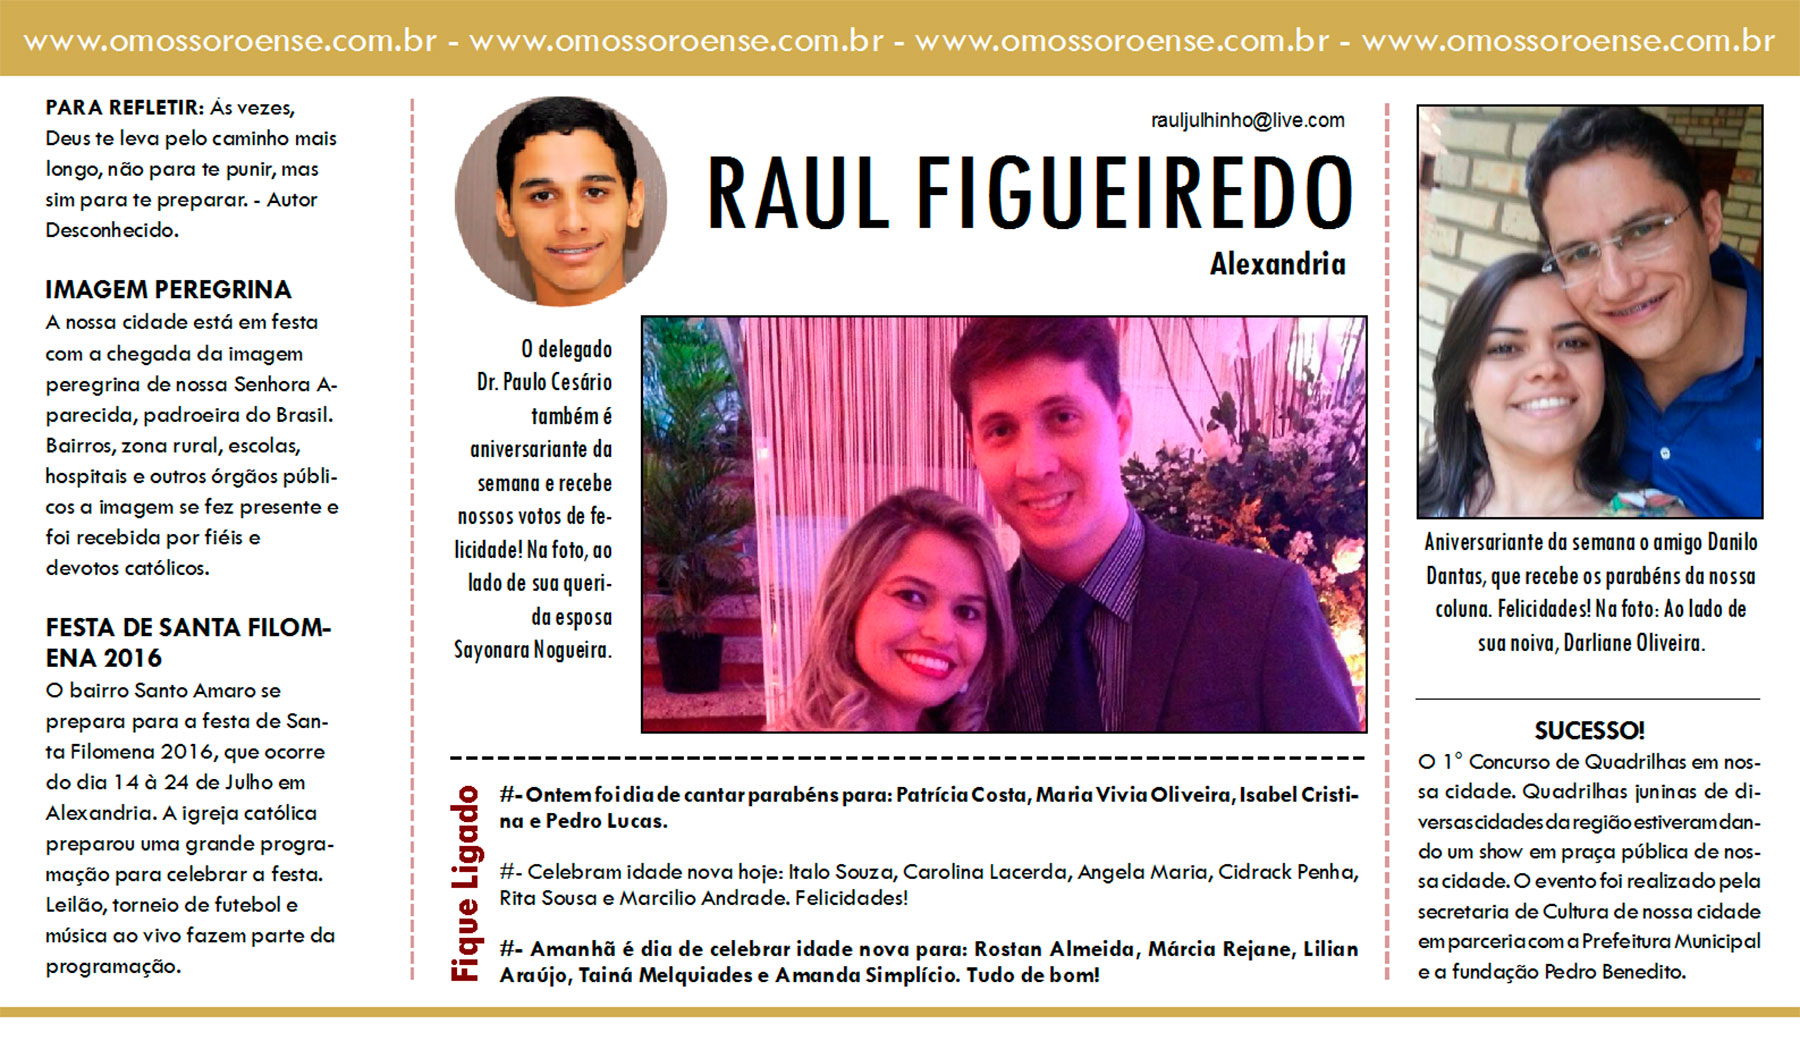 RAUL-FIGUEIREDO---28-06-2016